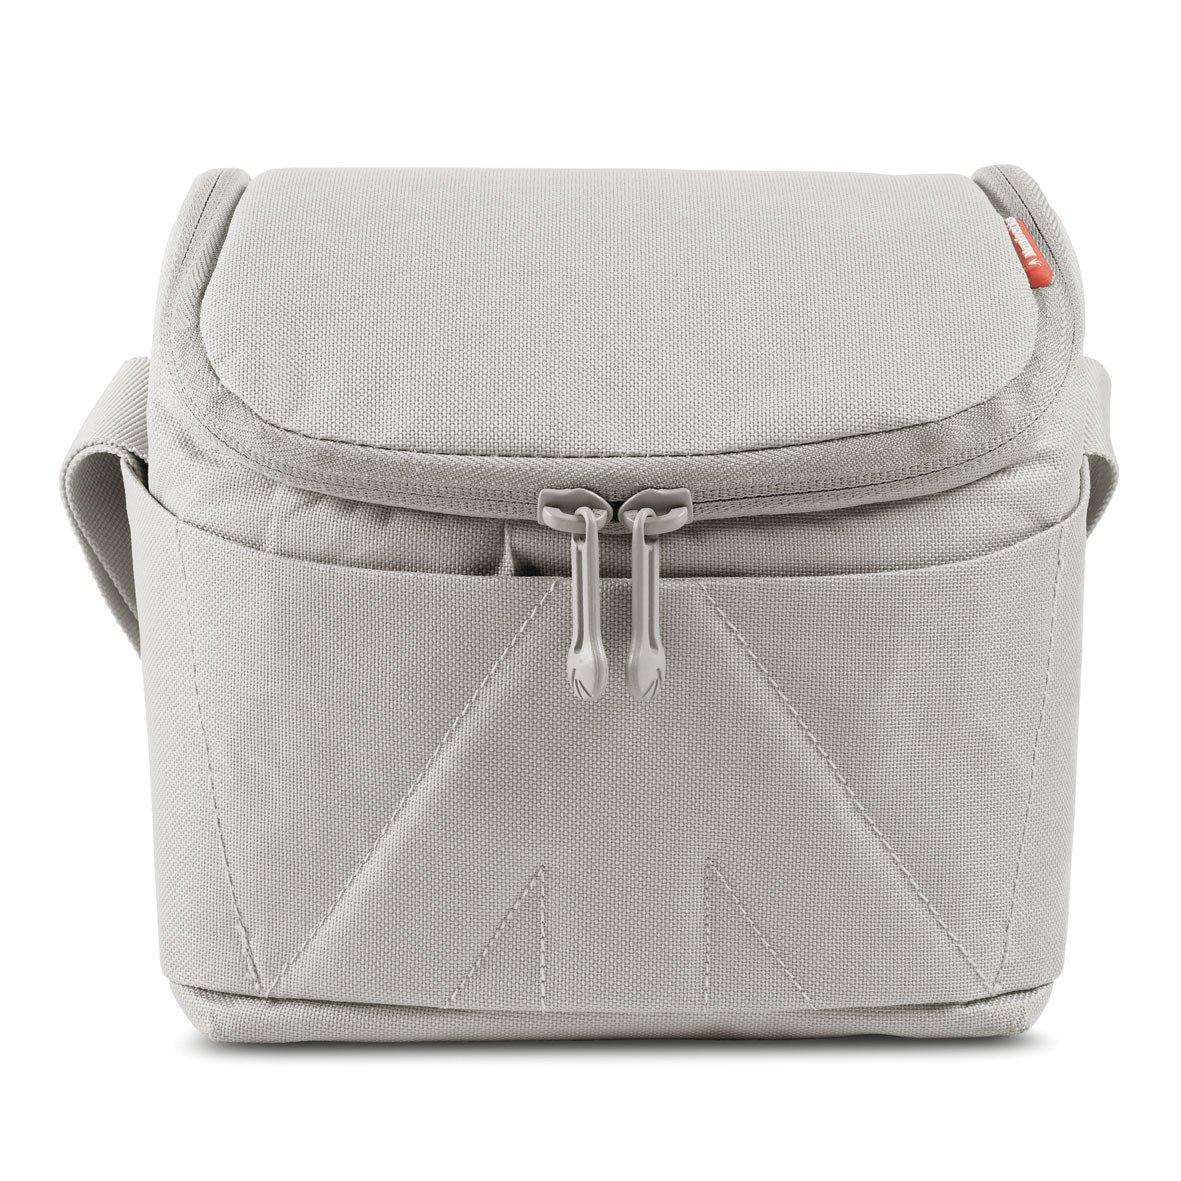 Manfrotto stile collection amica 40 shoulder bag dove for Case in stile adobe